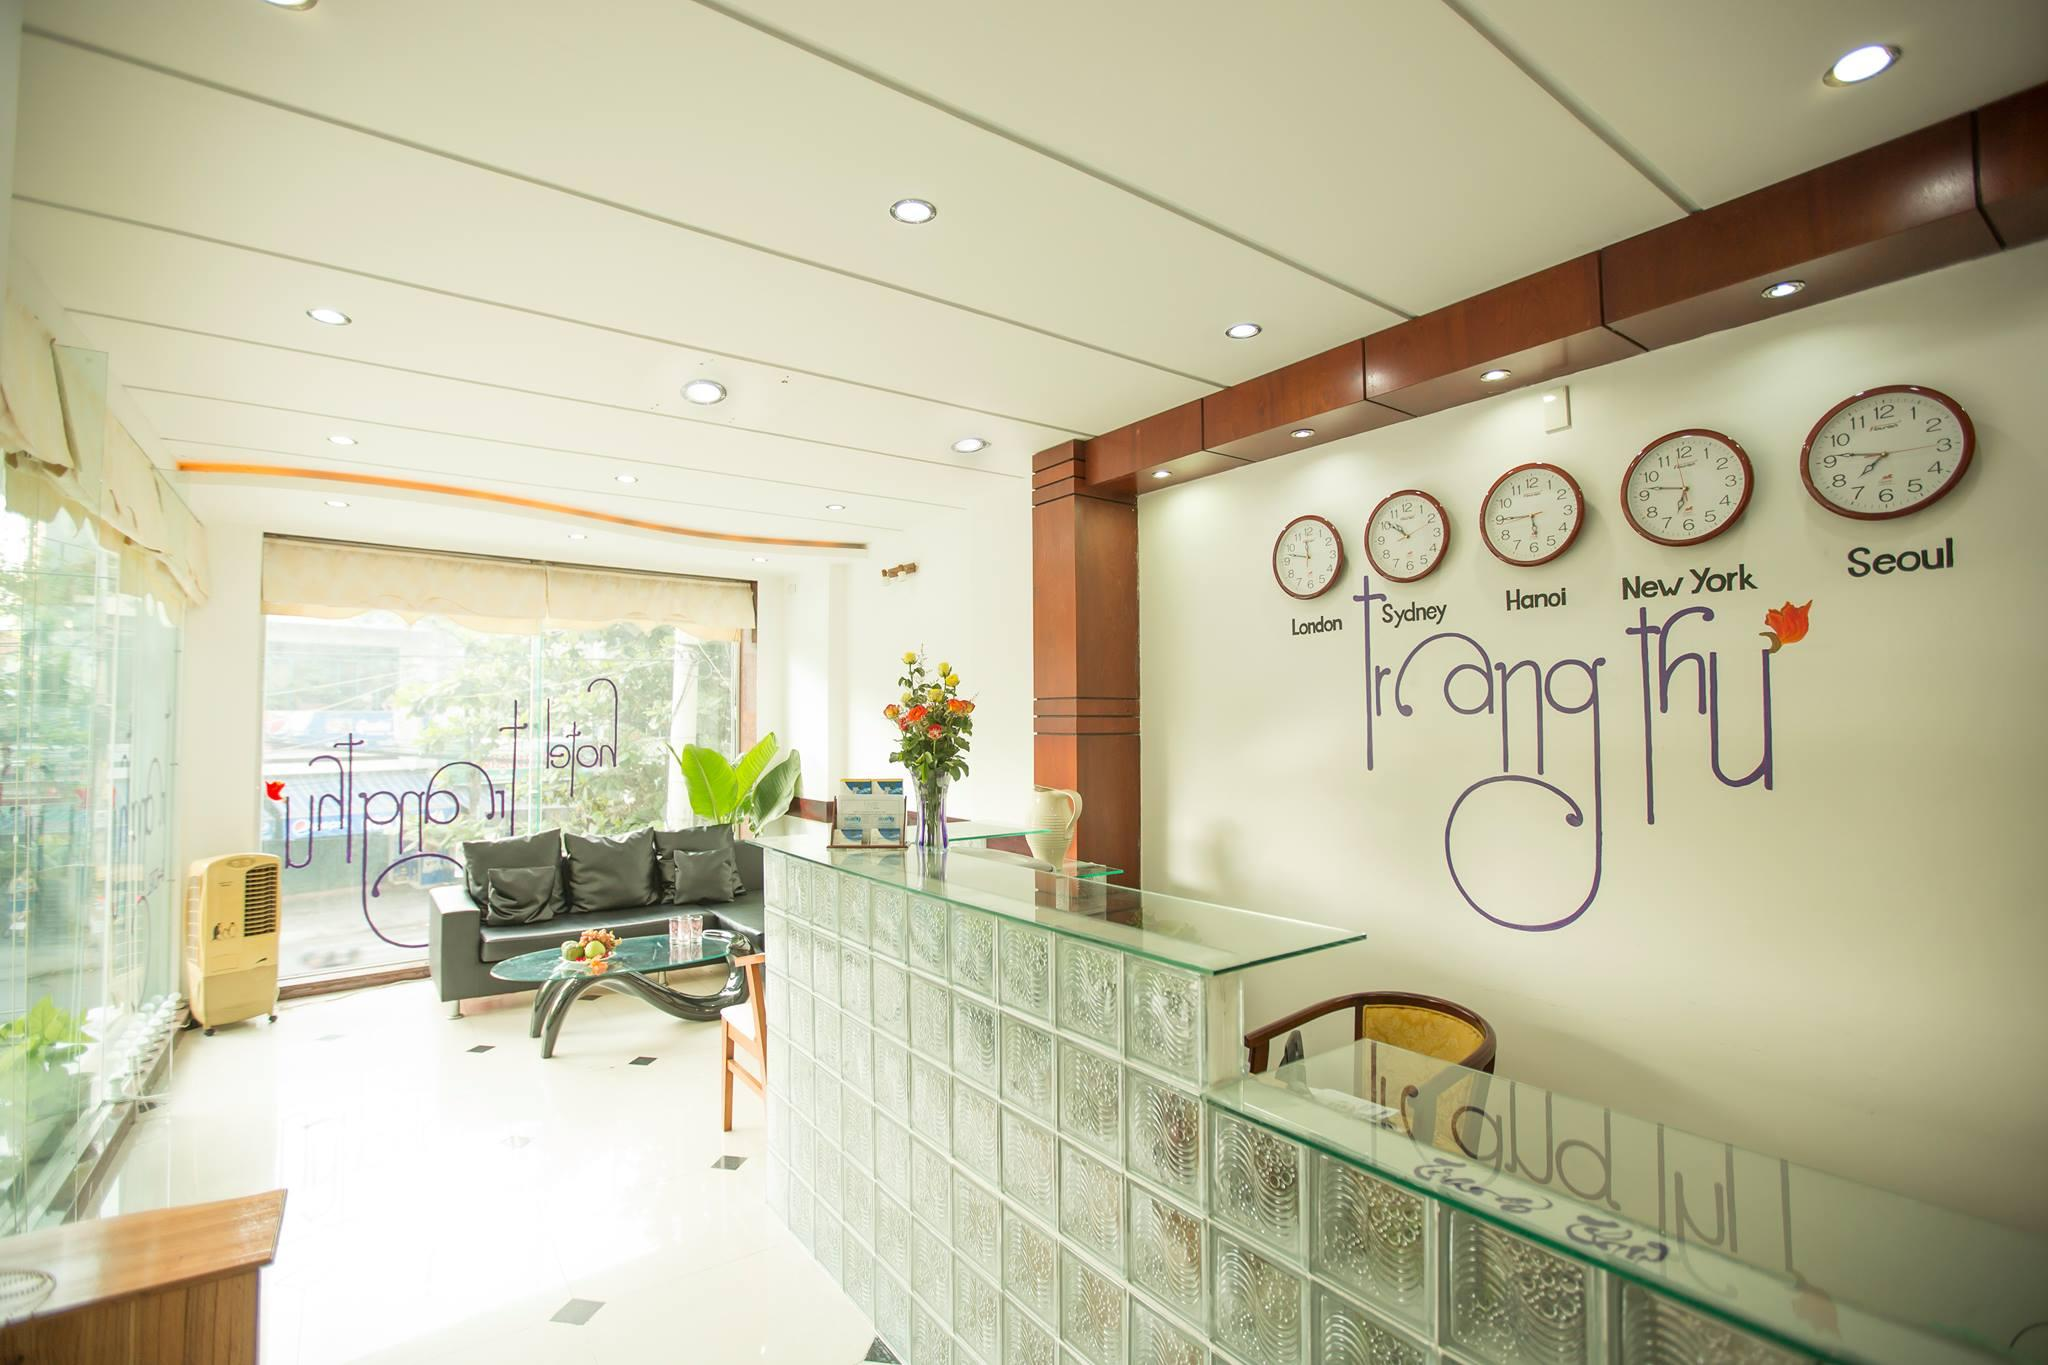 Trang Thu Hotel